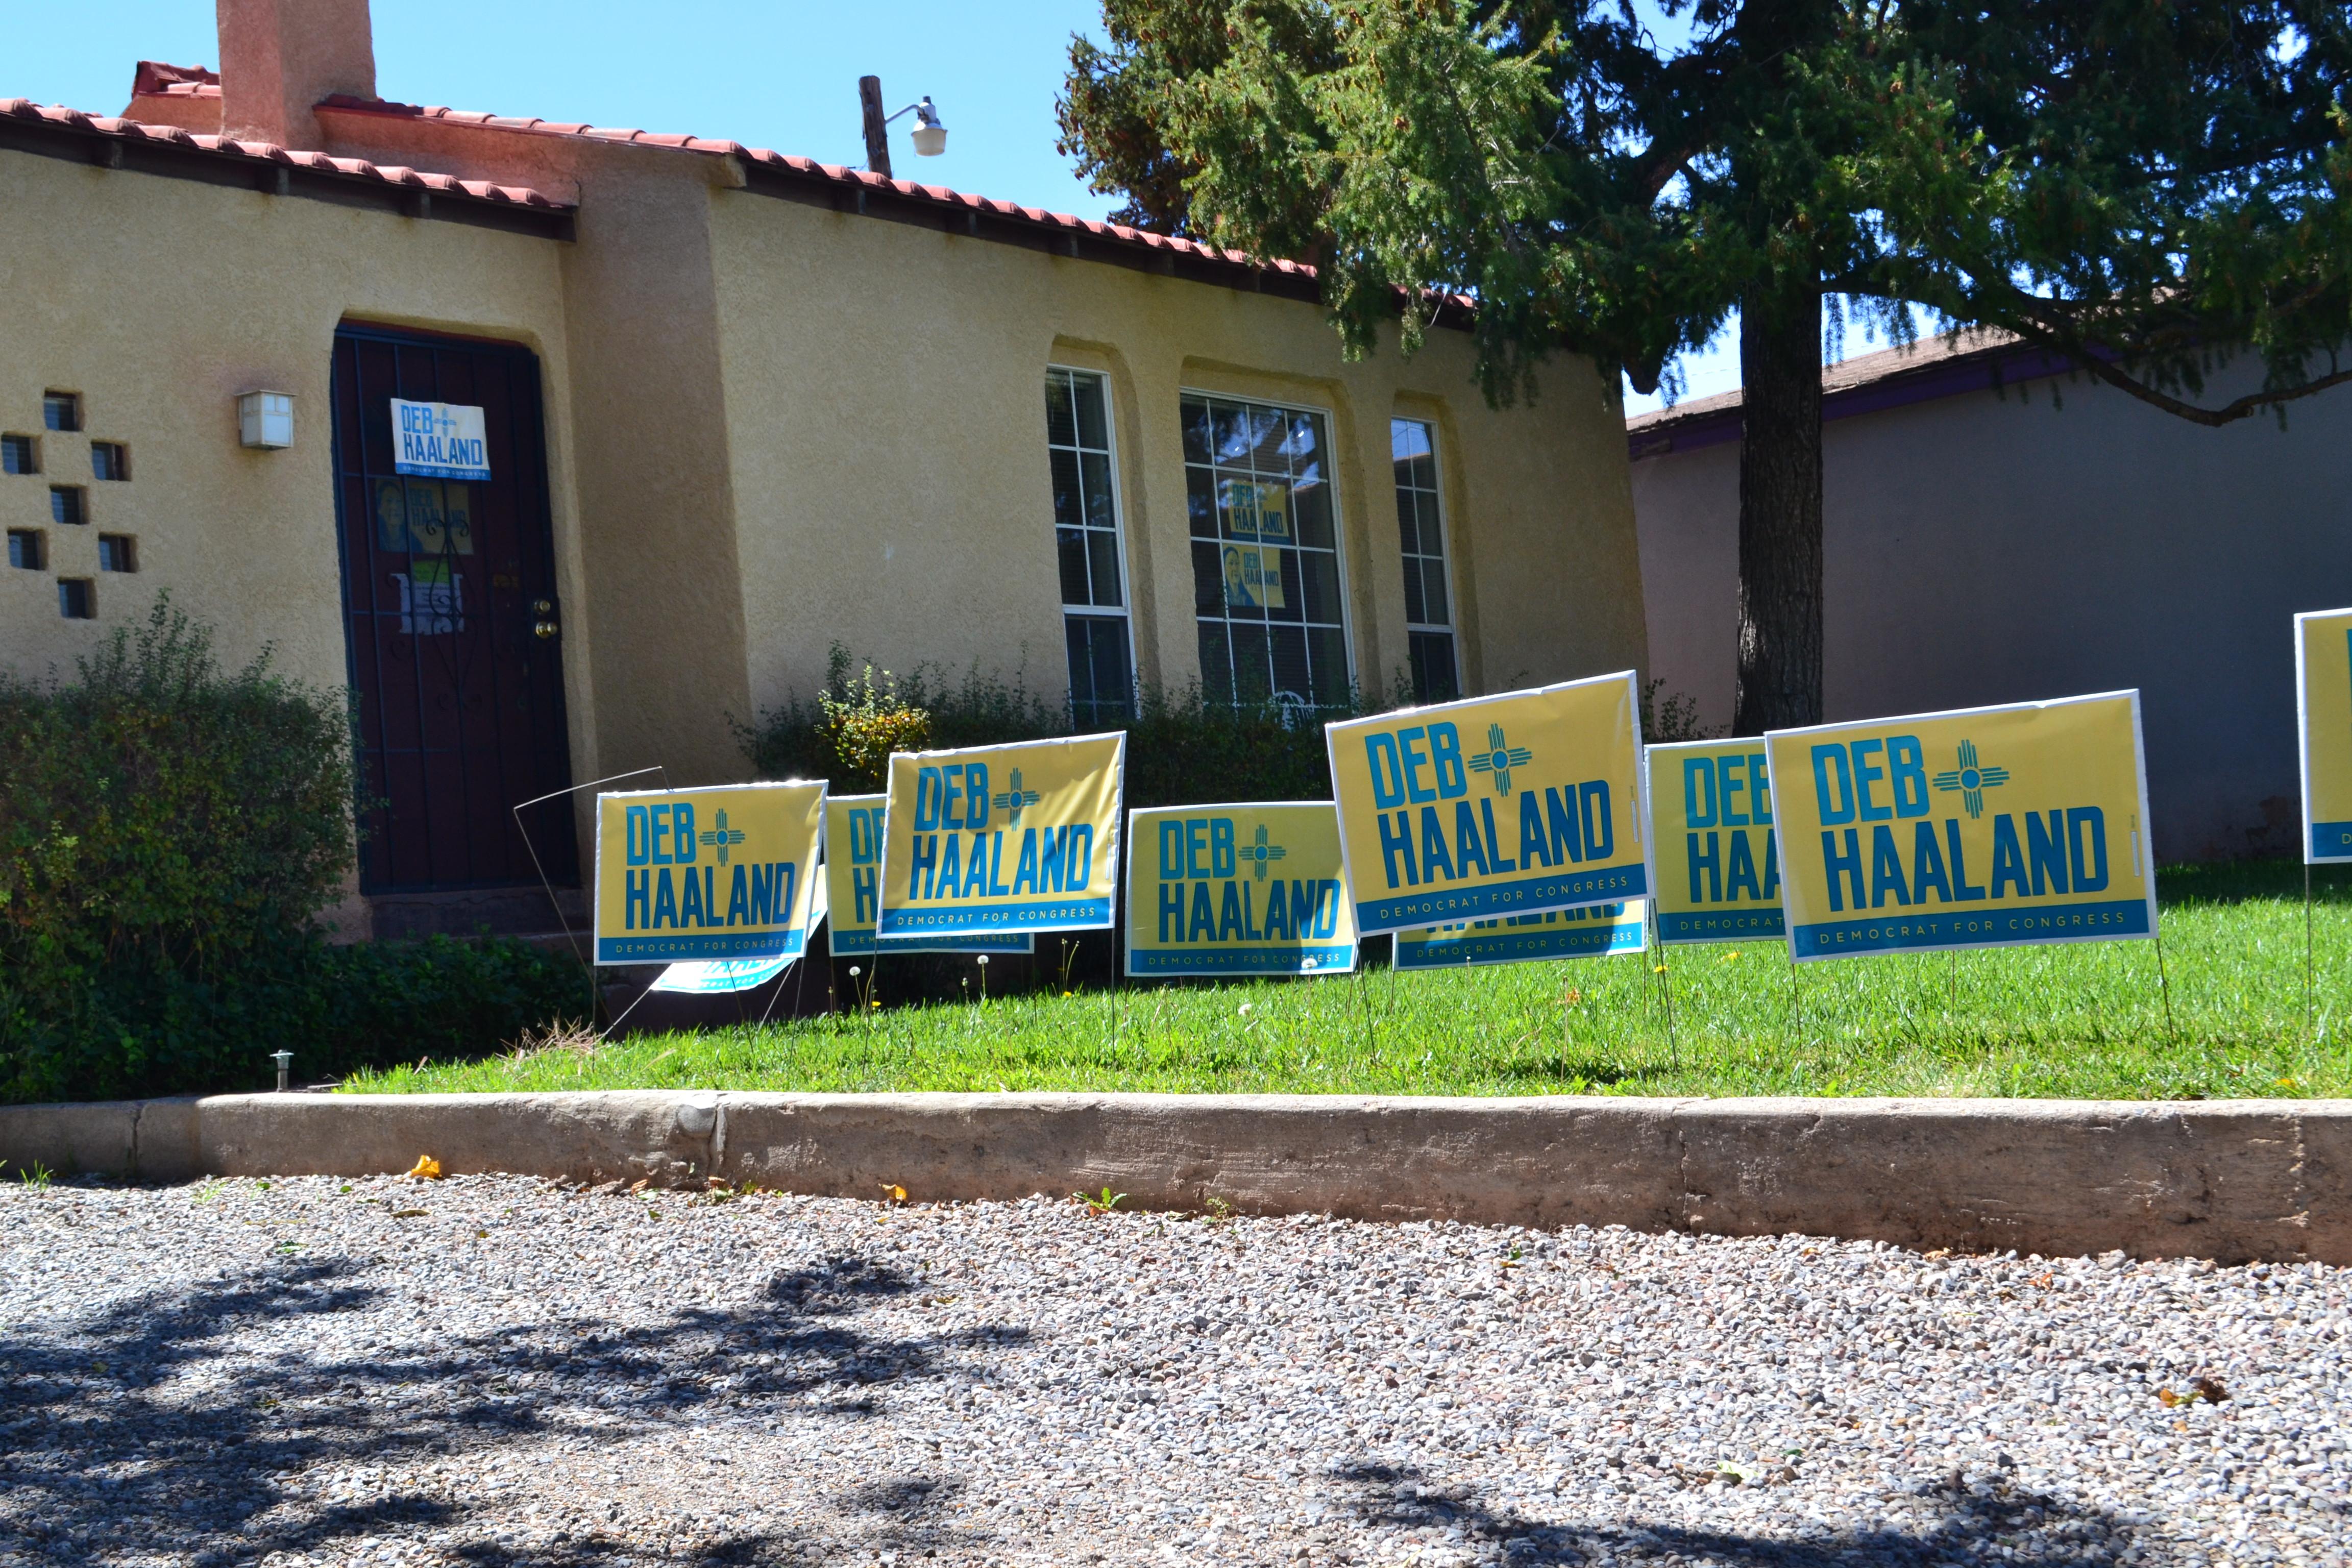 Debra Haaland's campaign headquarters